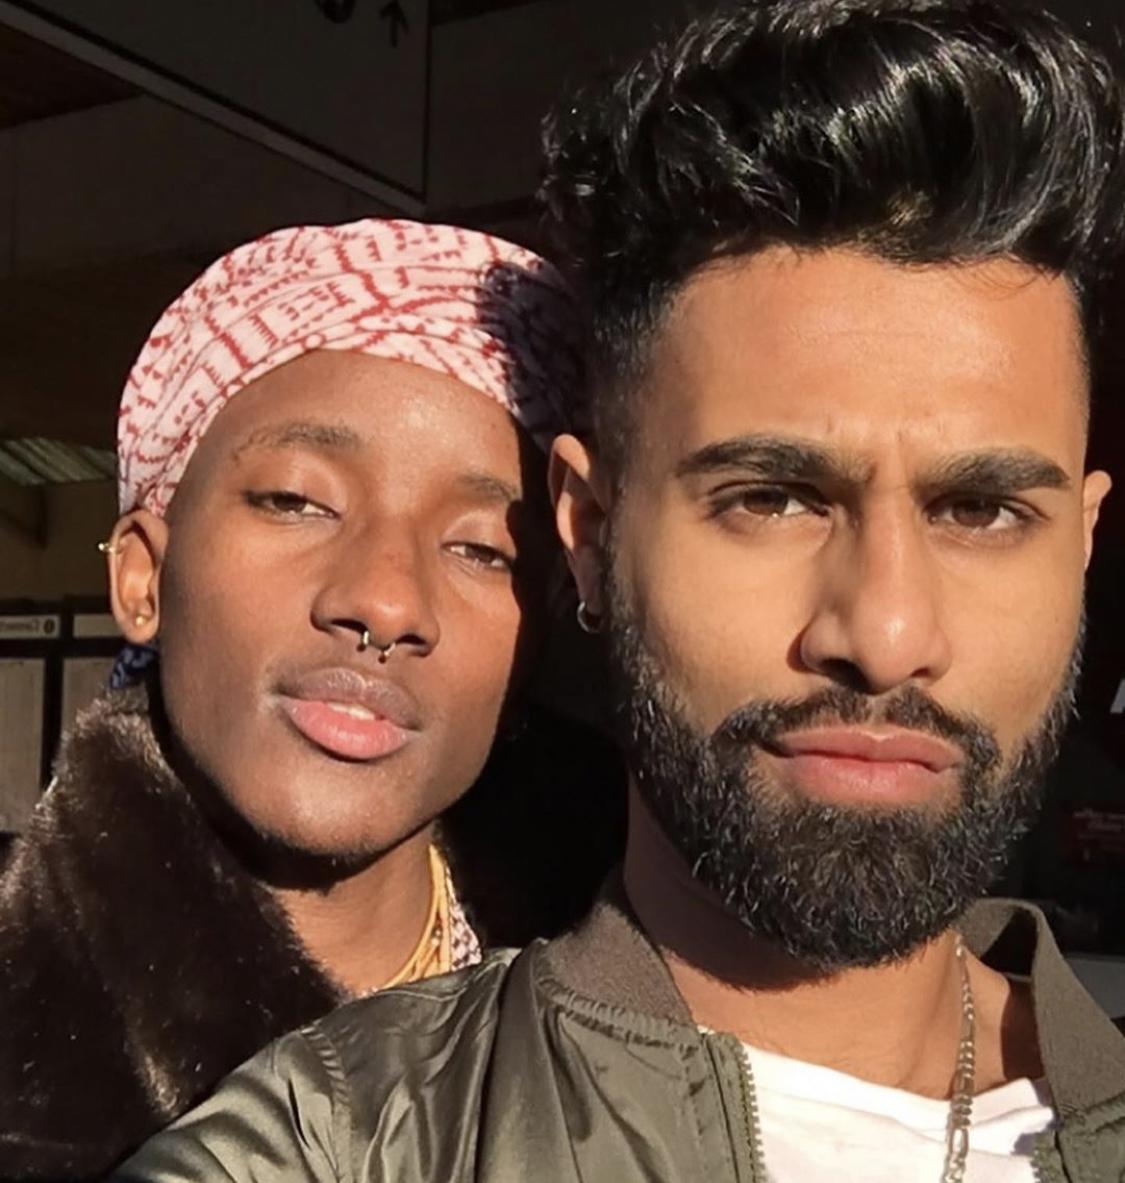 """Weh life inakupeleka aje na kabambe yako!"" Former Machachari actor Almasi shades haters critiquing his sexuality"